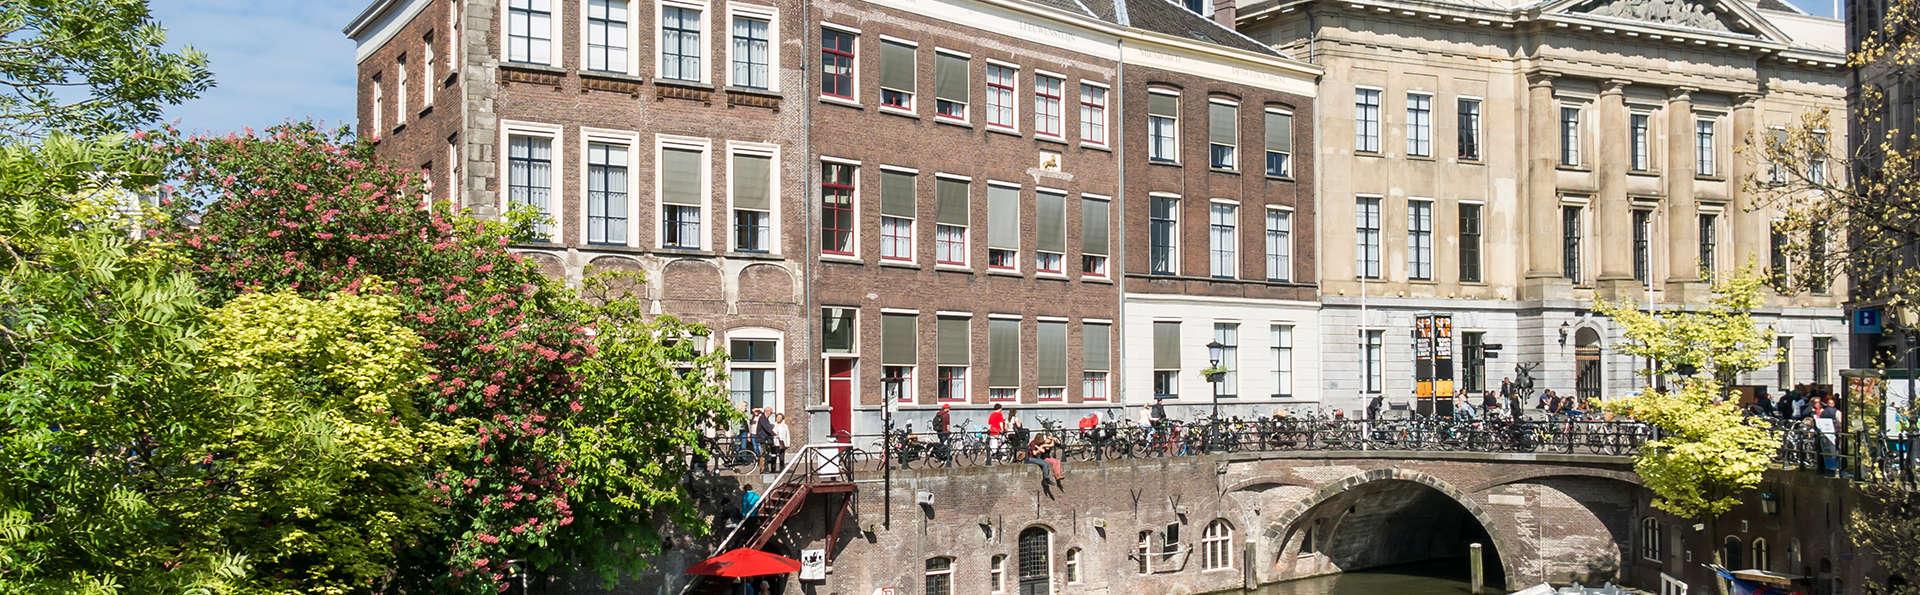 Ibis Utrecht - Edit_Utrecht2.jpg